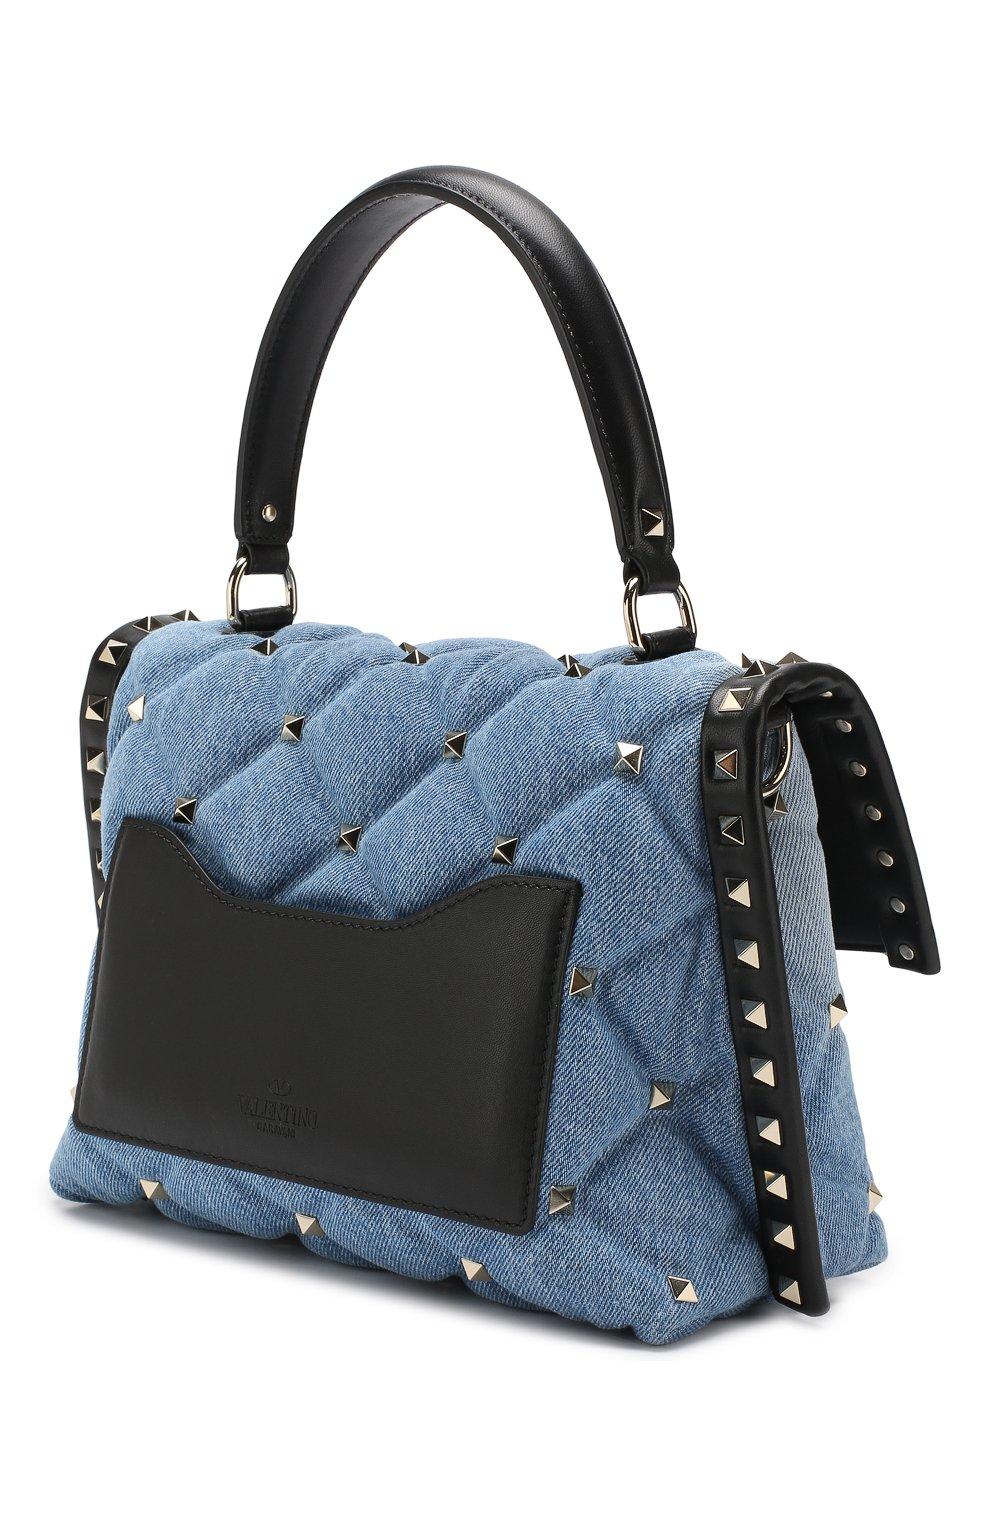 Сумка Valentino Garavani Candystud Valentino синяя цвета | Фото №3